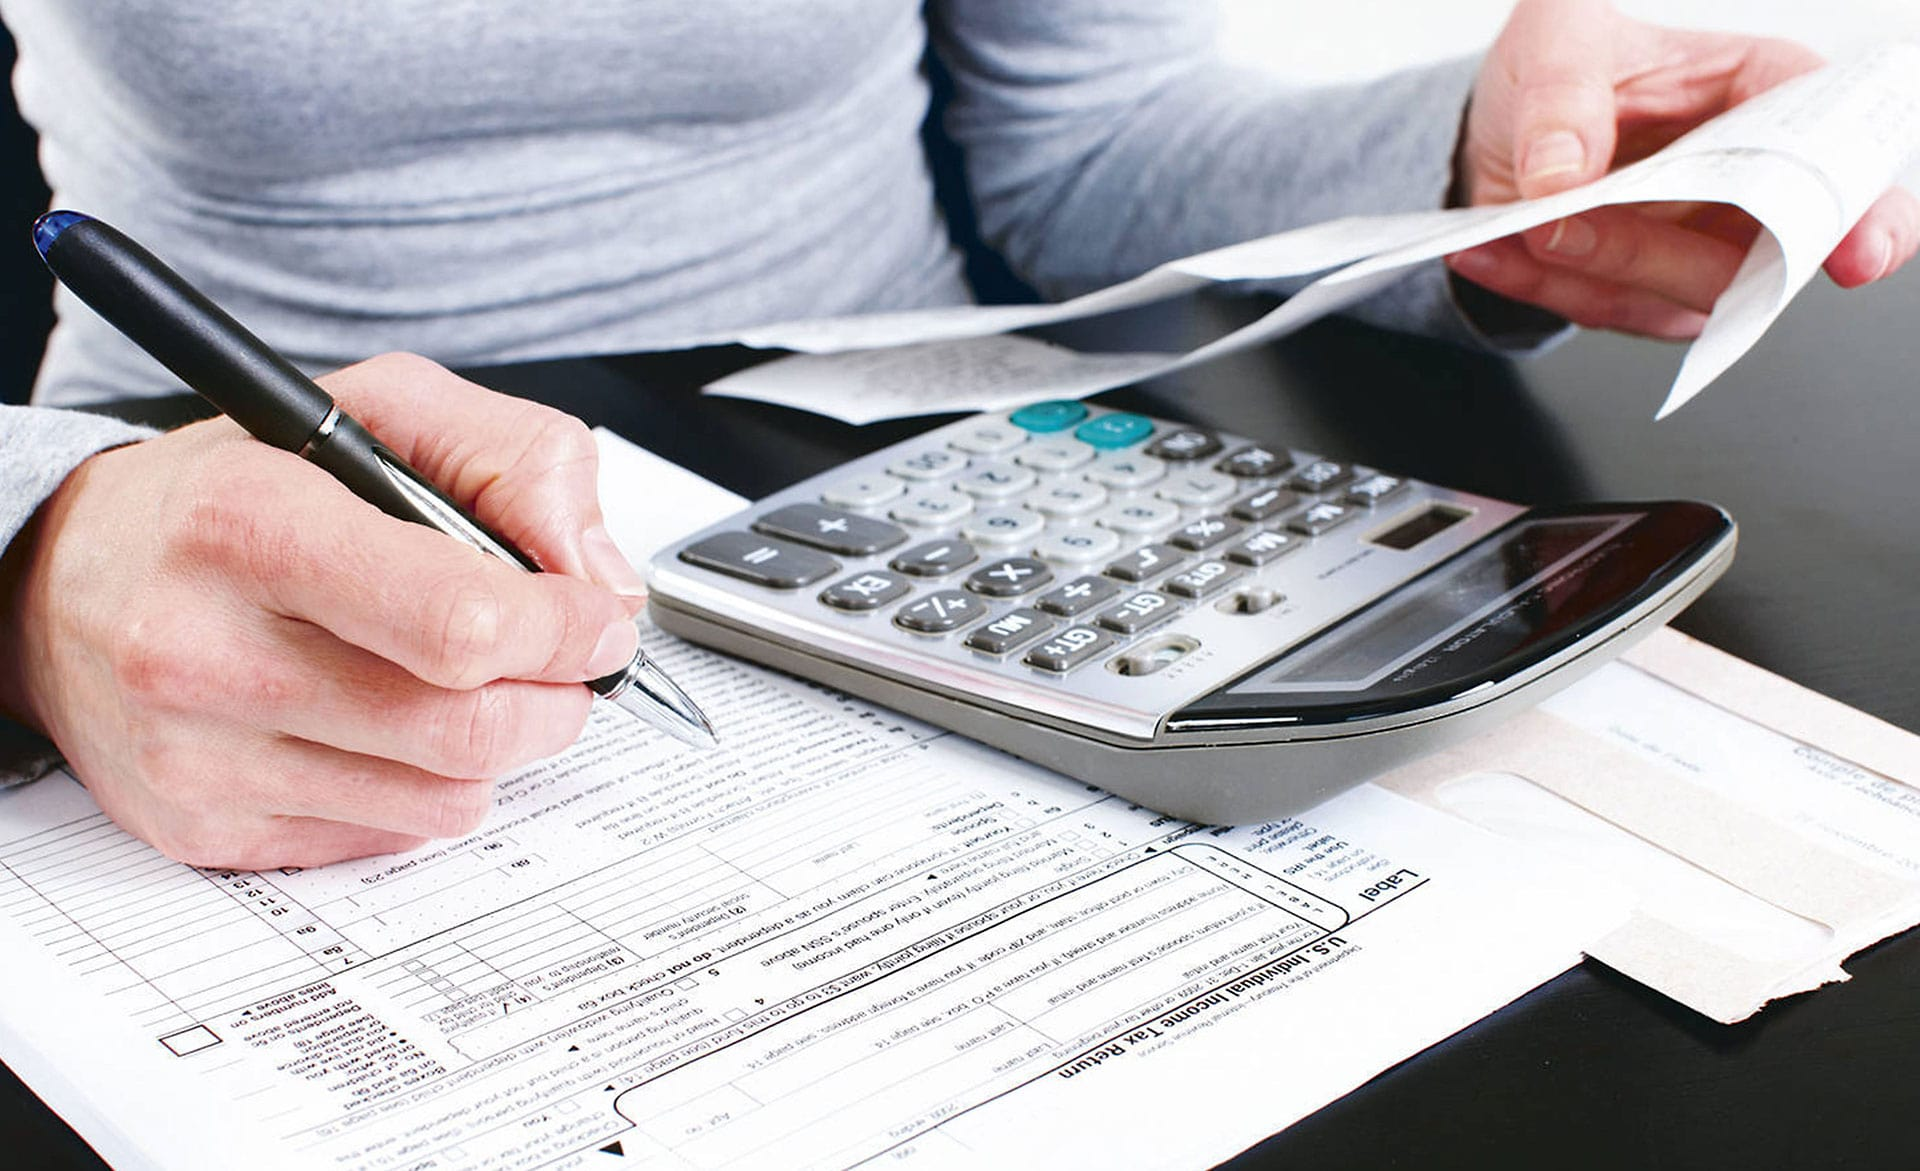 scadenze fiscali del mese di febbraio 2017 ecommerce guru